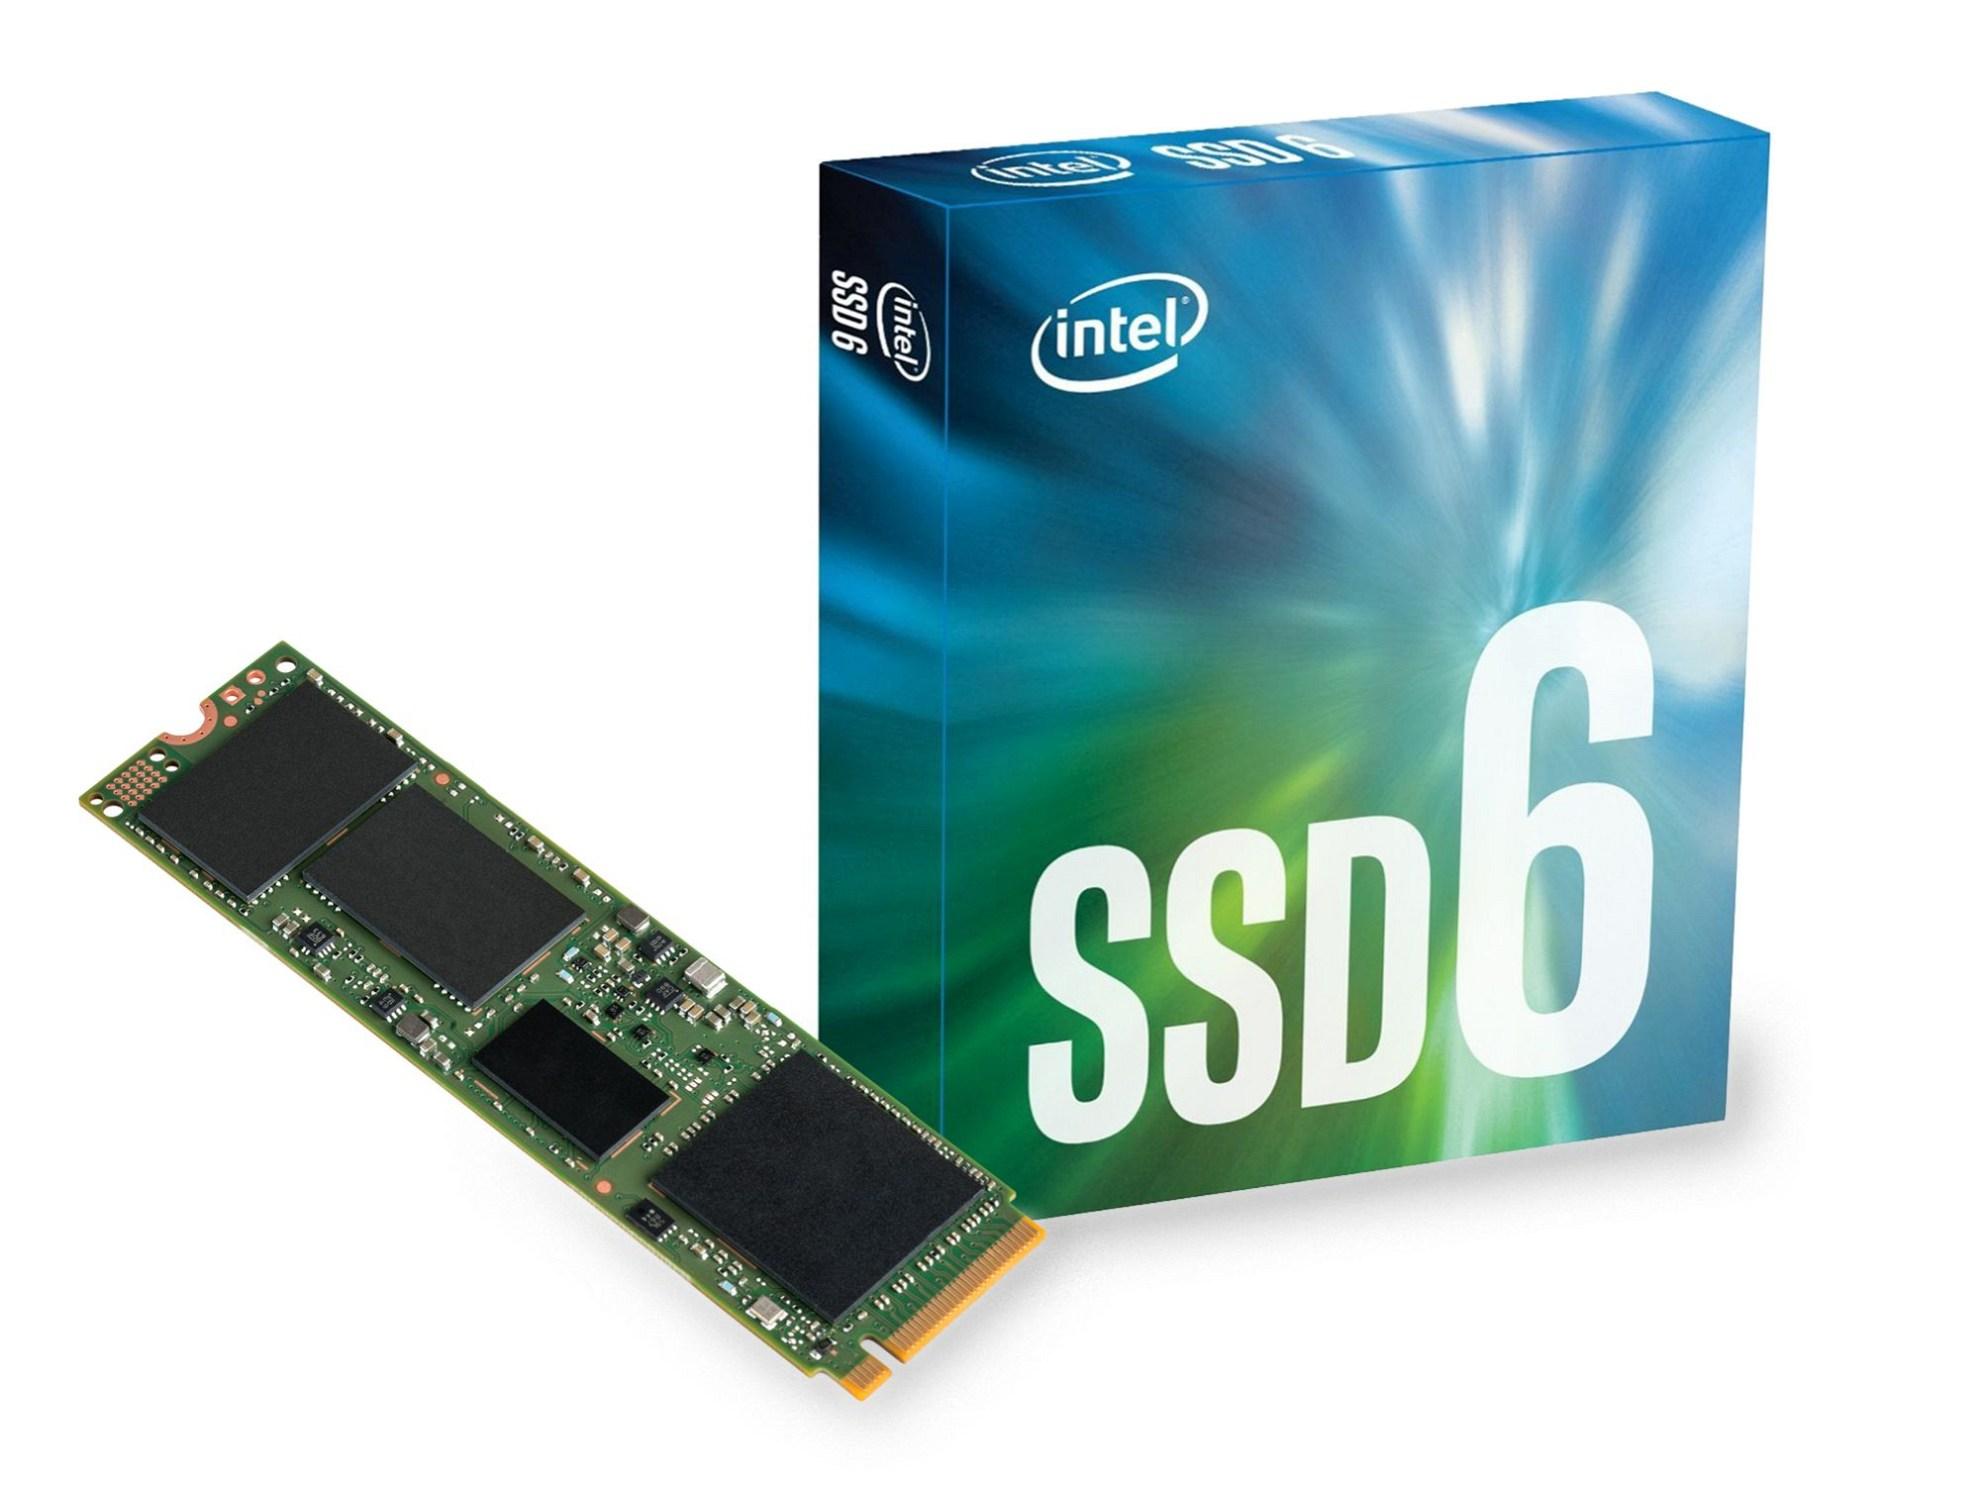 Asus 03B03-00038900 SSD Festplatte 128GB (M.2 22 x 80 mm) PCIe NVMe 3.0 x4